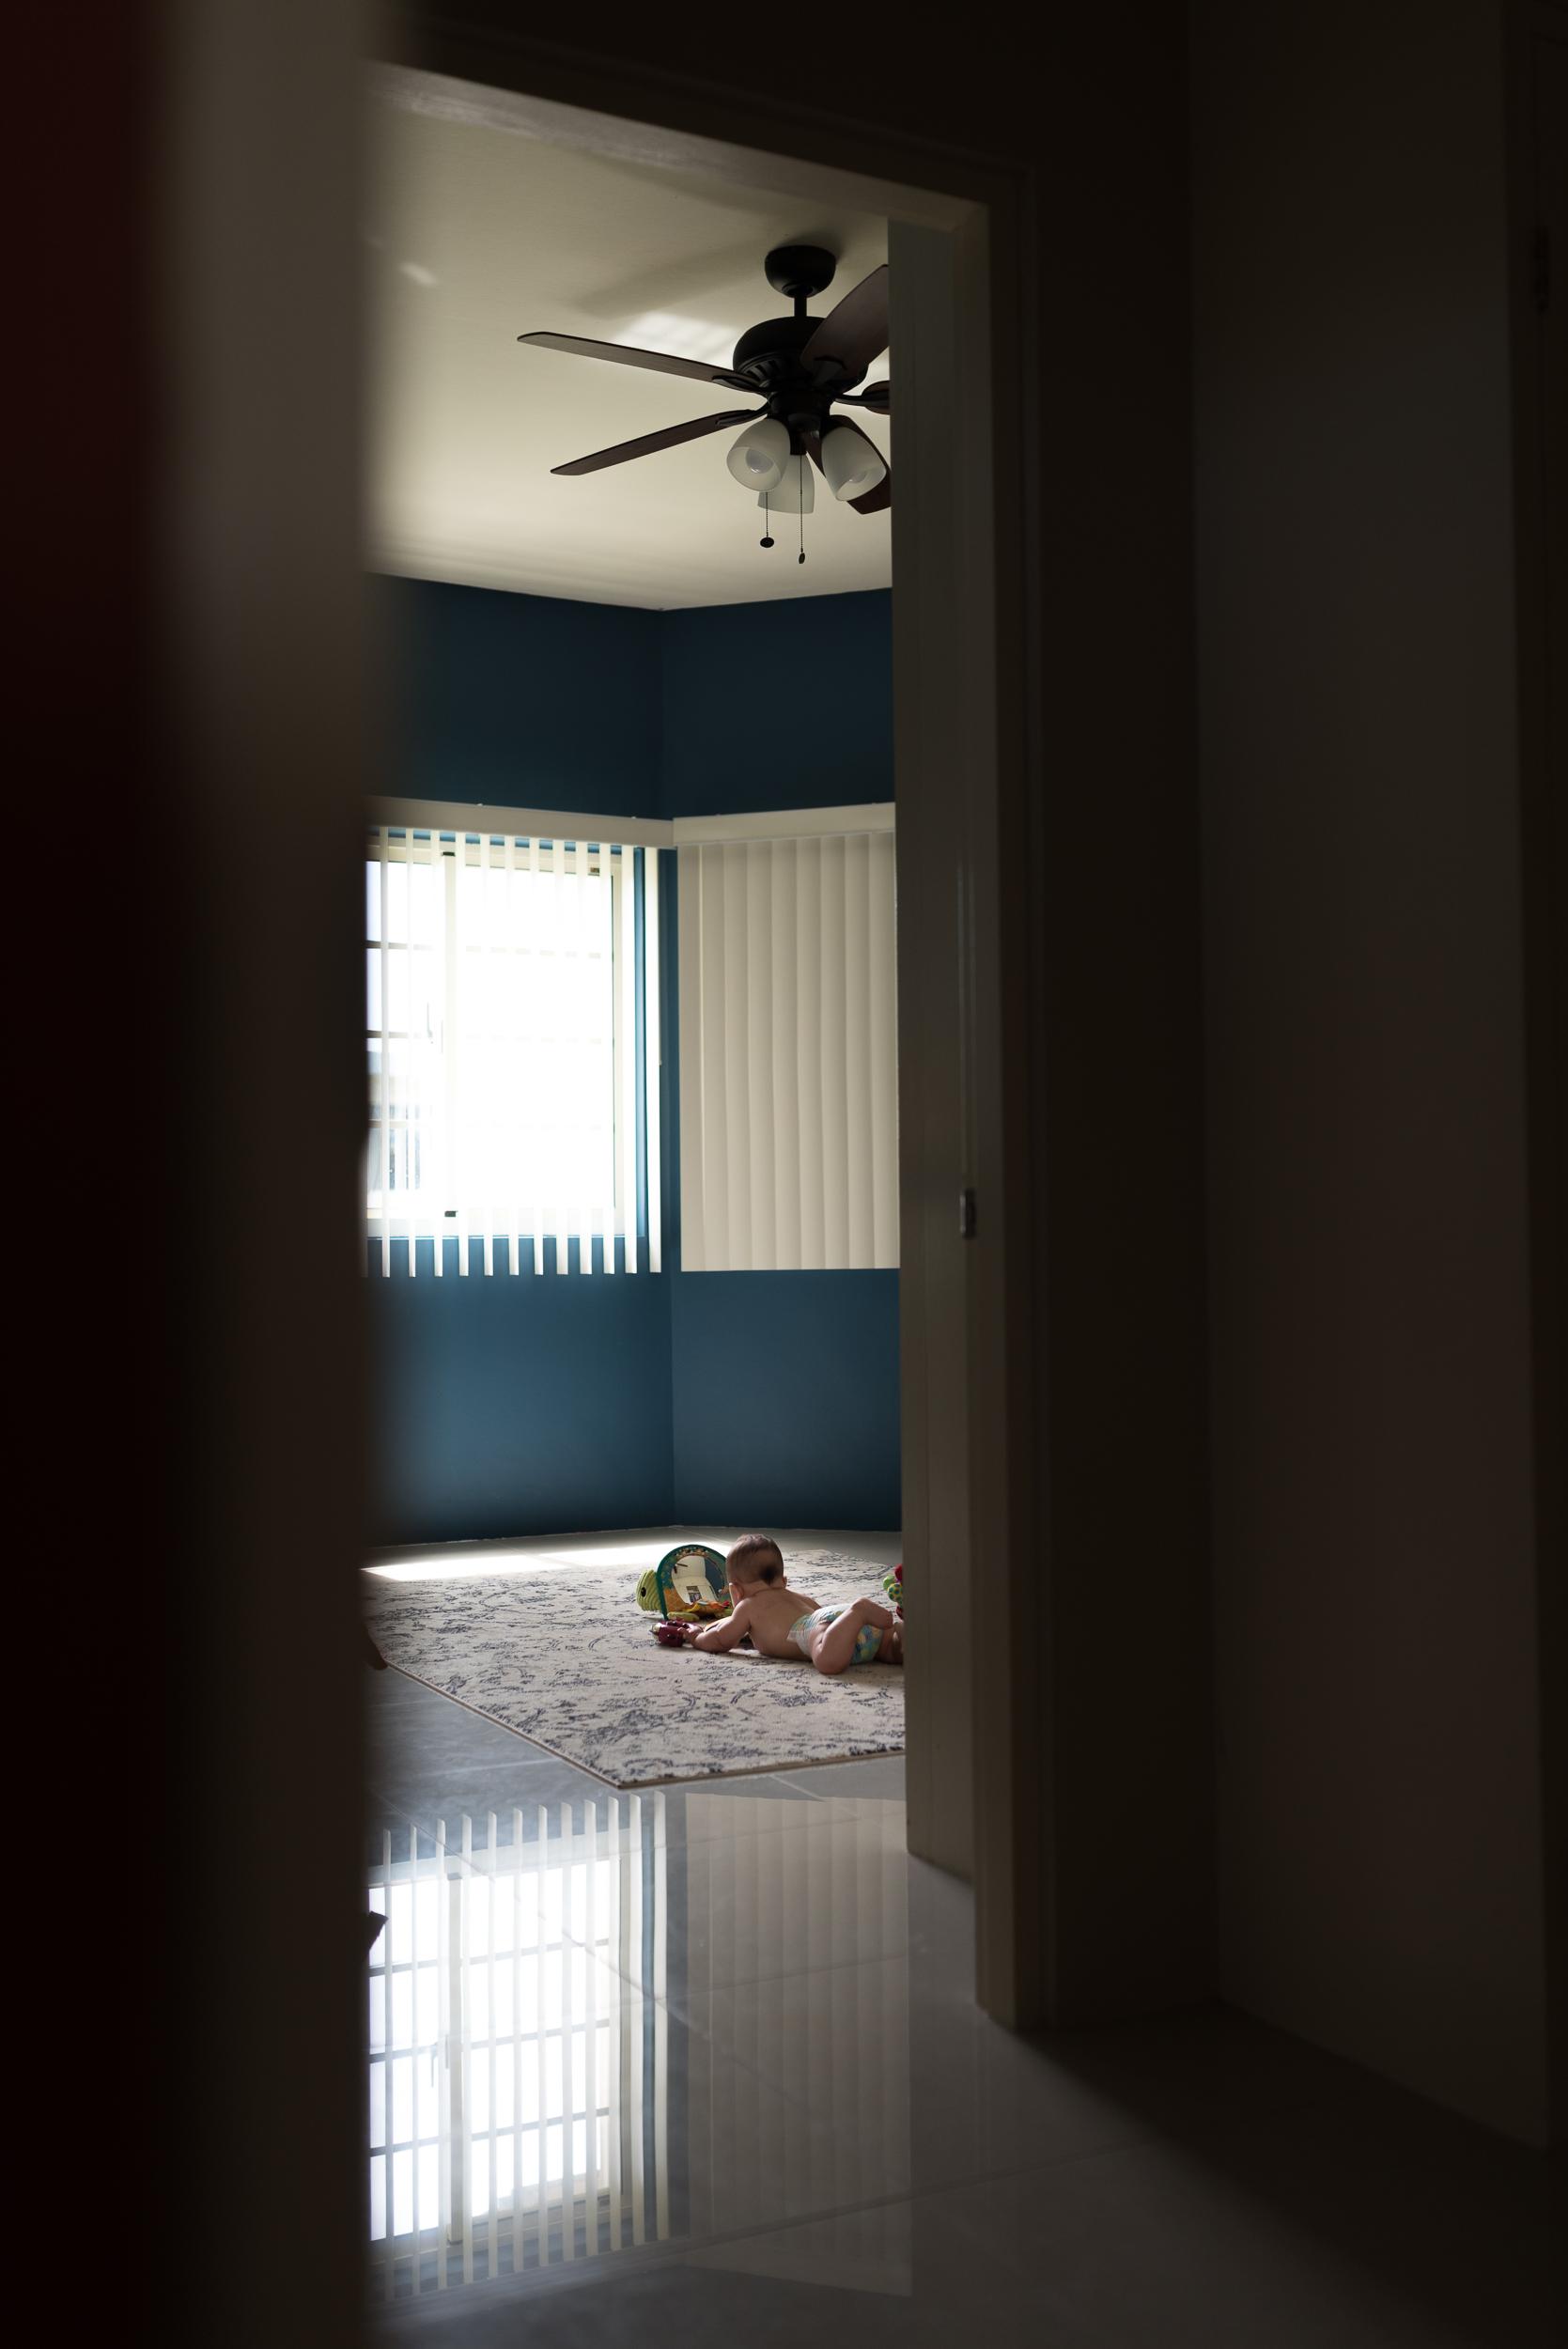 baby-year-one-motherhood-roxanne-augusta-guam-photography-11.jpg